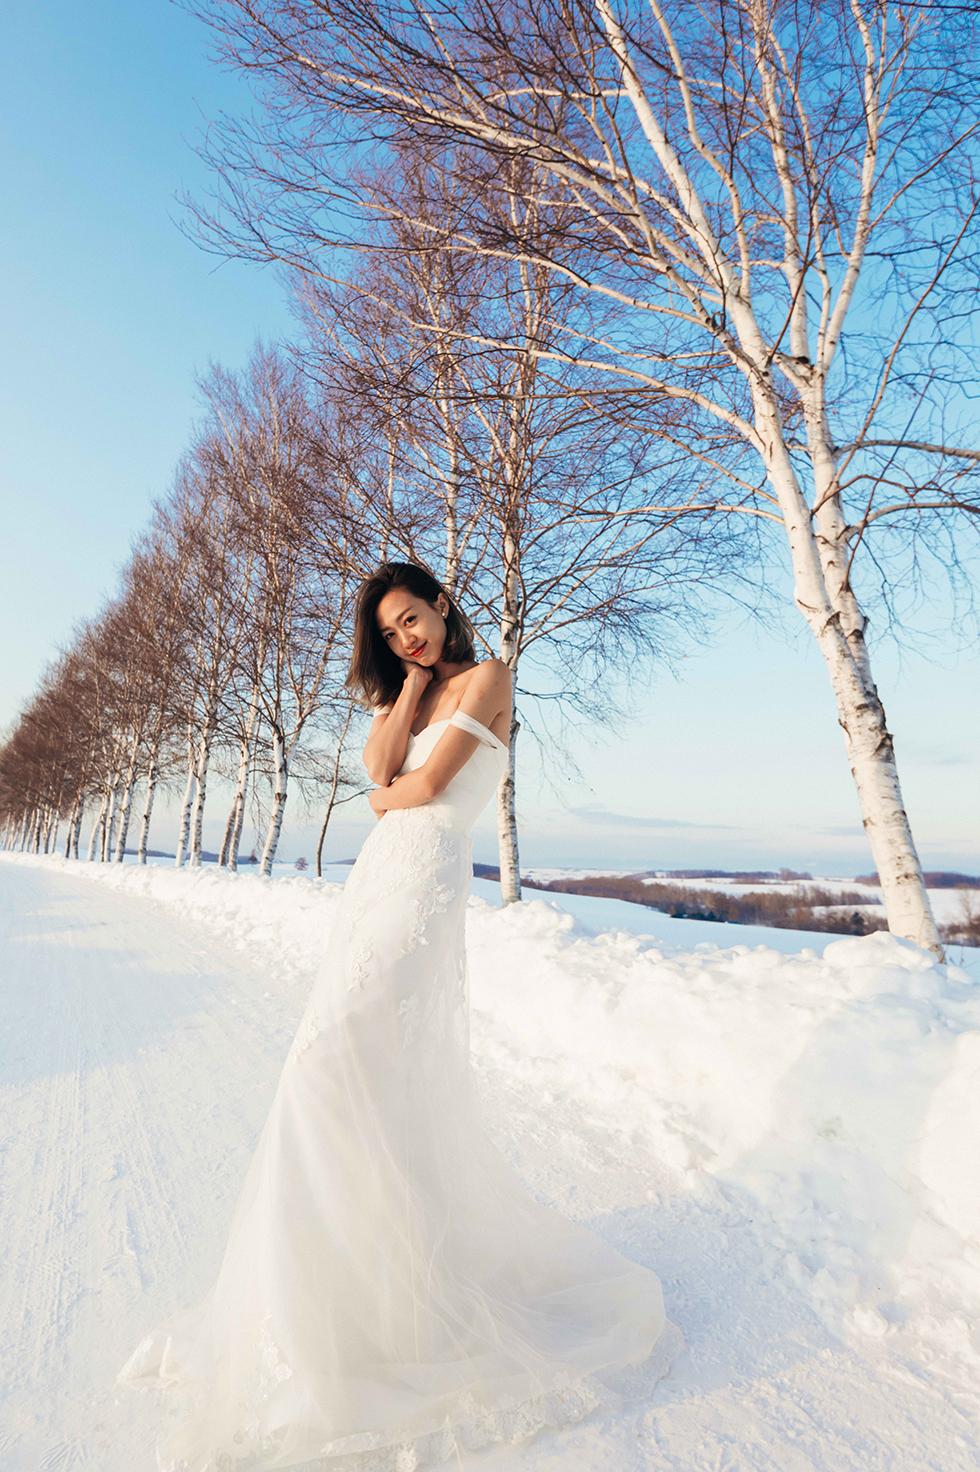 %255BHokkaido%255D%2BGUI067- 婚攝, 婚禮攝影, 婚紗包套, 婚禮紀錄, 親子寫真, 美式婚紗攝影, 自助婚紗, 小資婚紗, 婚攝推薦, 家庭寫真, 孕婦寫真, 顏氏牧場婚攝, 林酒店婚攝, 萊特薇庭婚攝, 婚攝推薦, 婚紗婚攝, 婚紗攝影, 婚禮攝影推薦, 自助婚紗